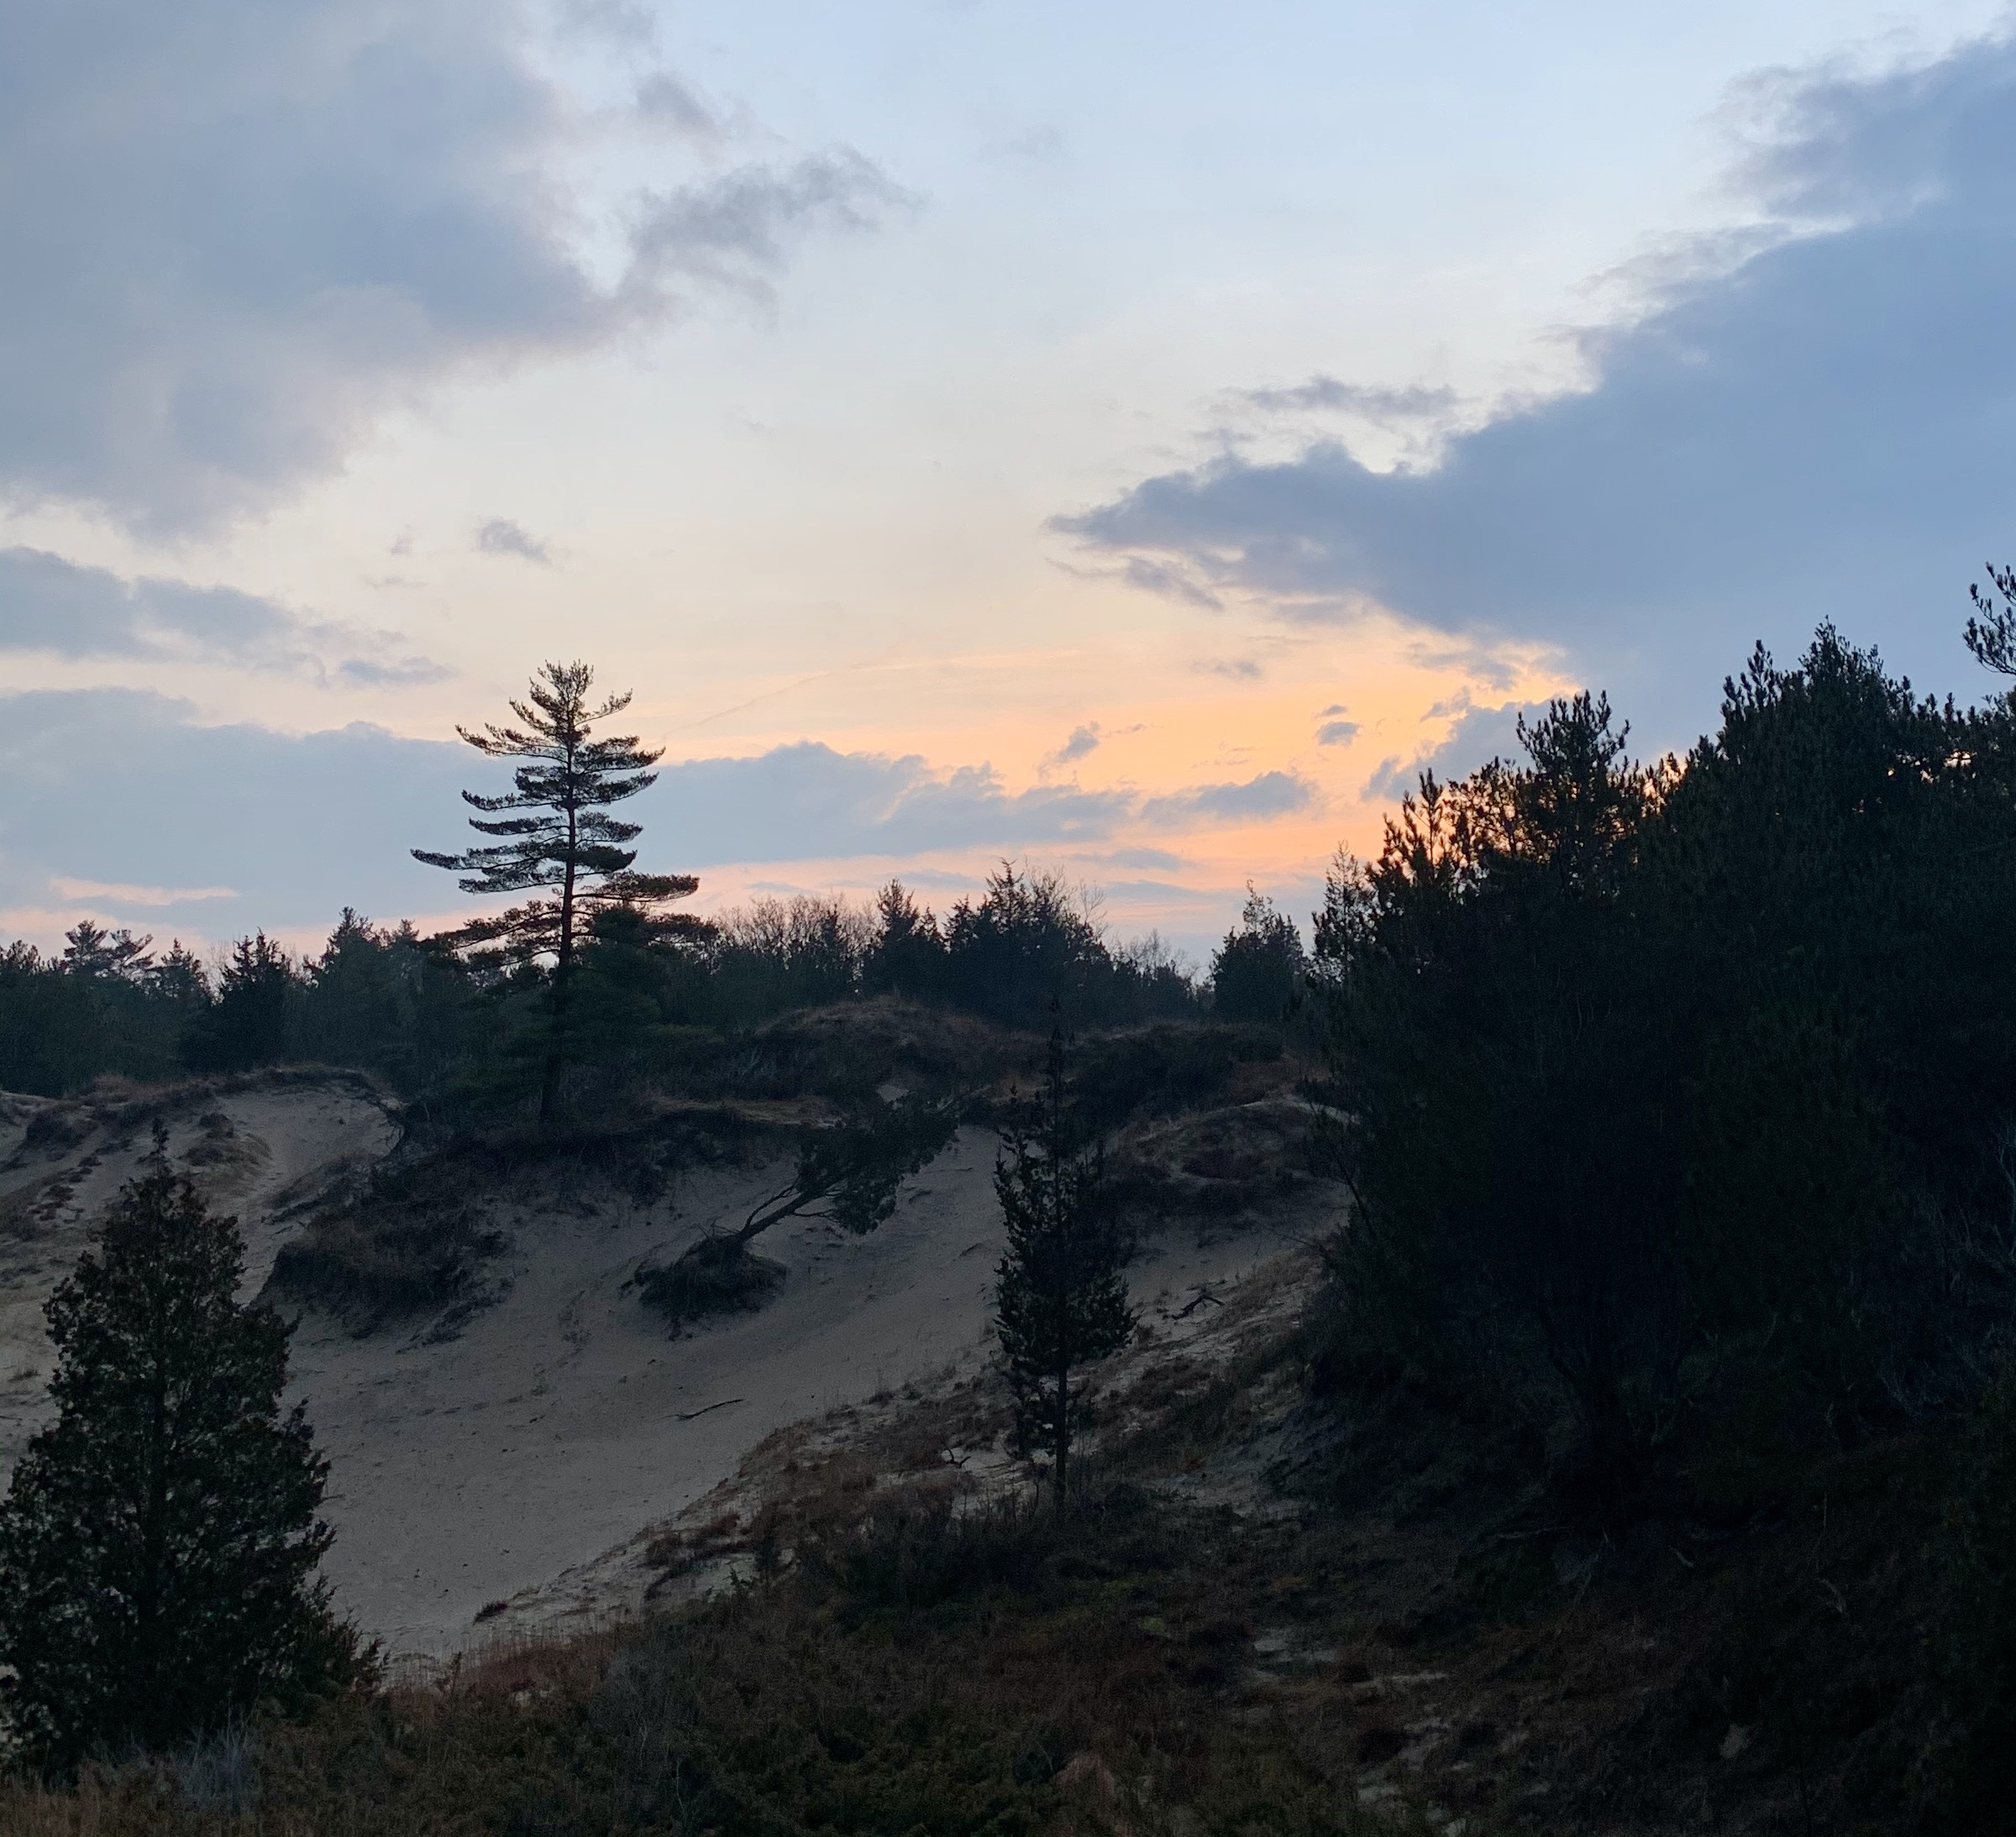 sand dunes, trees, and sunrise